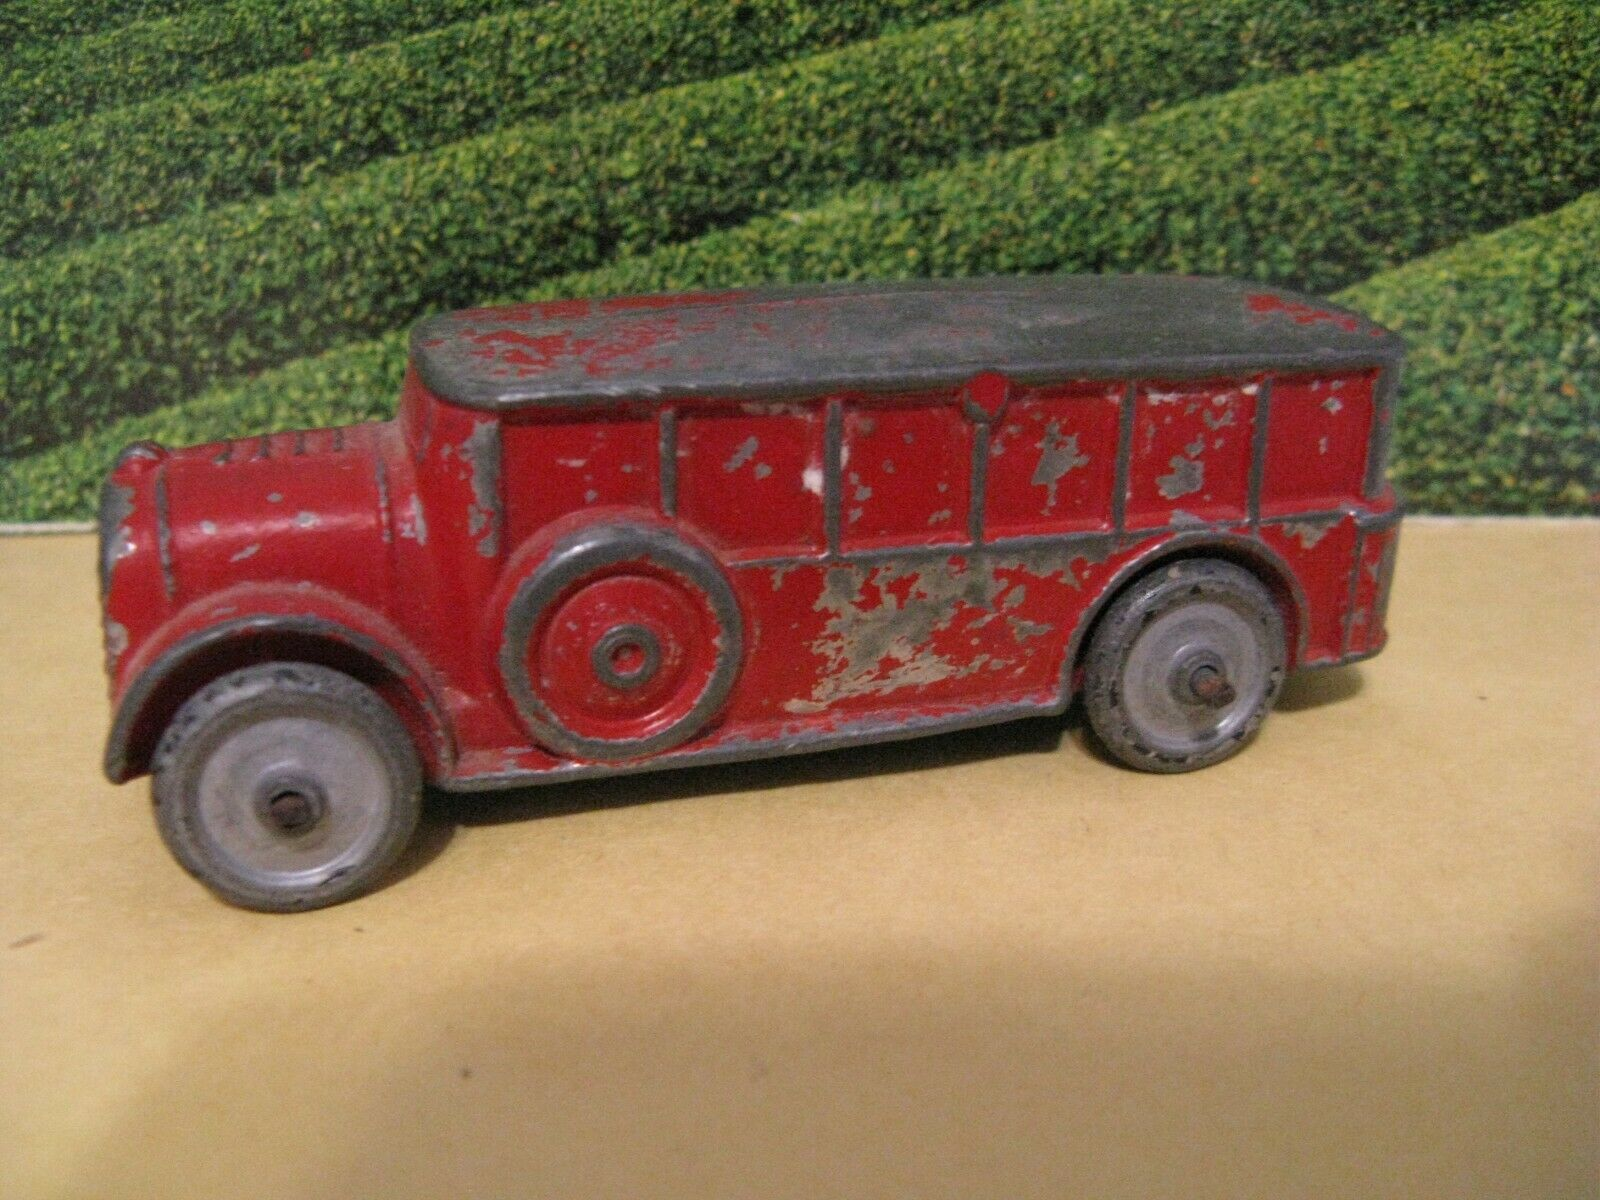 1928 Charles A. Wood Novelty Co C.A.W Vintage Slush Mold Touring & Overland Bus